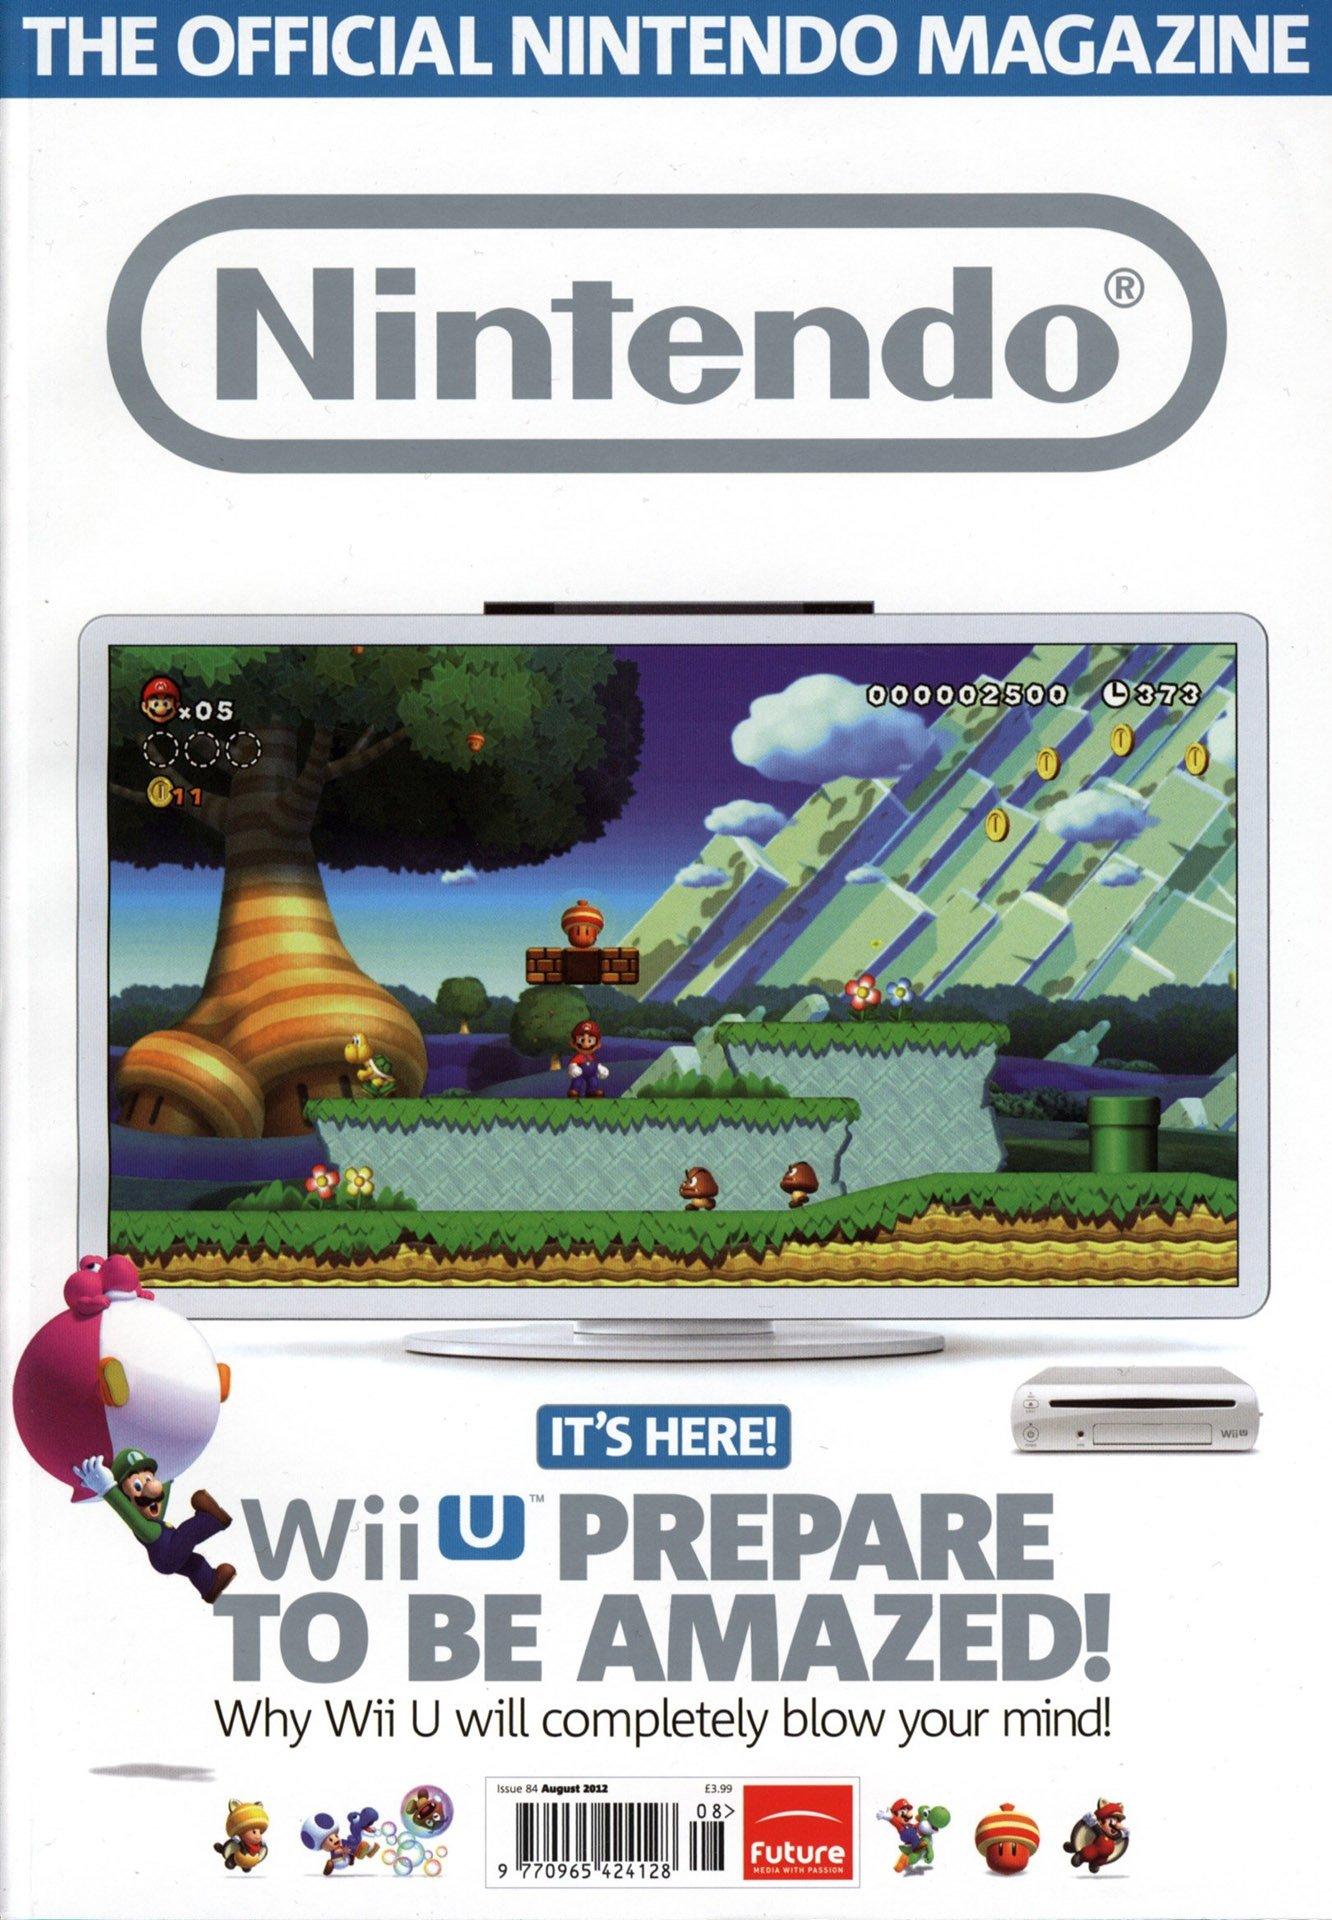 Official Nintendo Magazine 084 (August 2012)